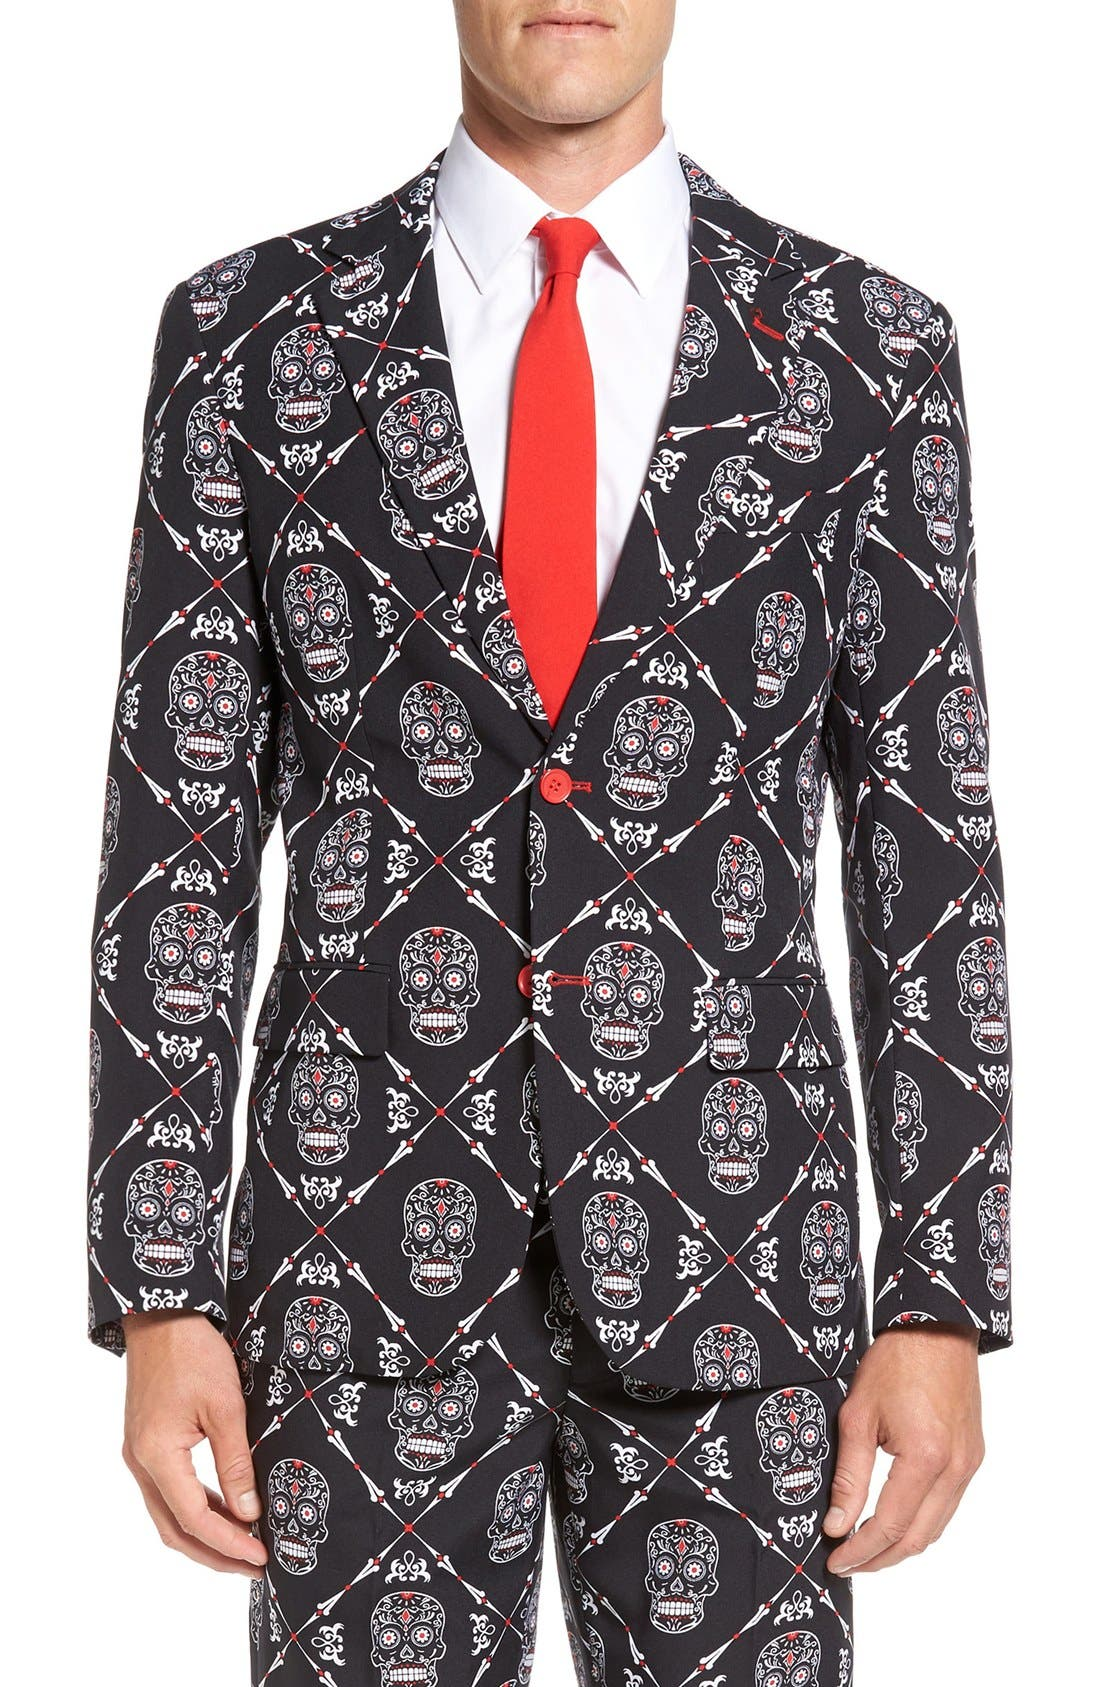 'Haunting Hombre' Trim Fit Suit with Tie,                             Alternate thumbnail 6, color,                             001